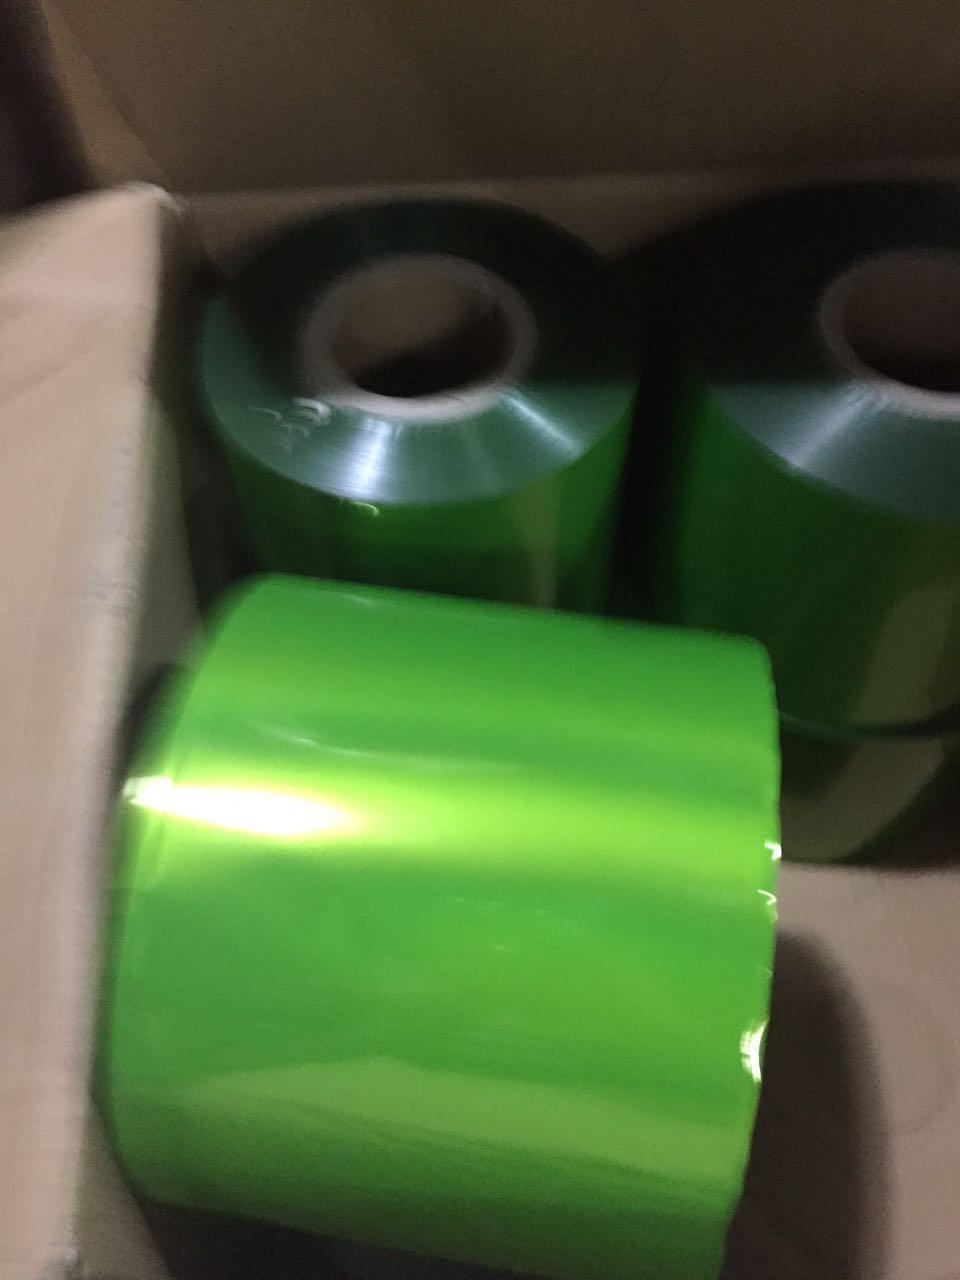 Poly Bag Bopp Film For Tea Packing Machine,3 Kg/Roll Colorful Plastic Packing Bag(Support Customize) 100pcs fishing lures bag ziplock 11cm 13cm self seal zipper plastic retail packing poly bag ziplock zip lock bag package